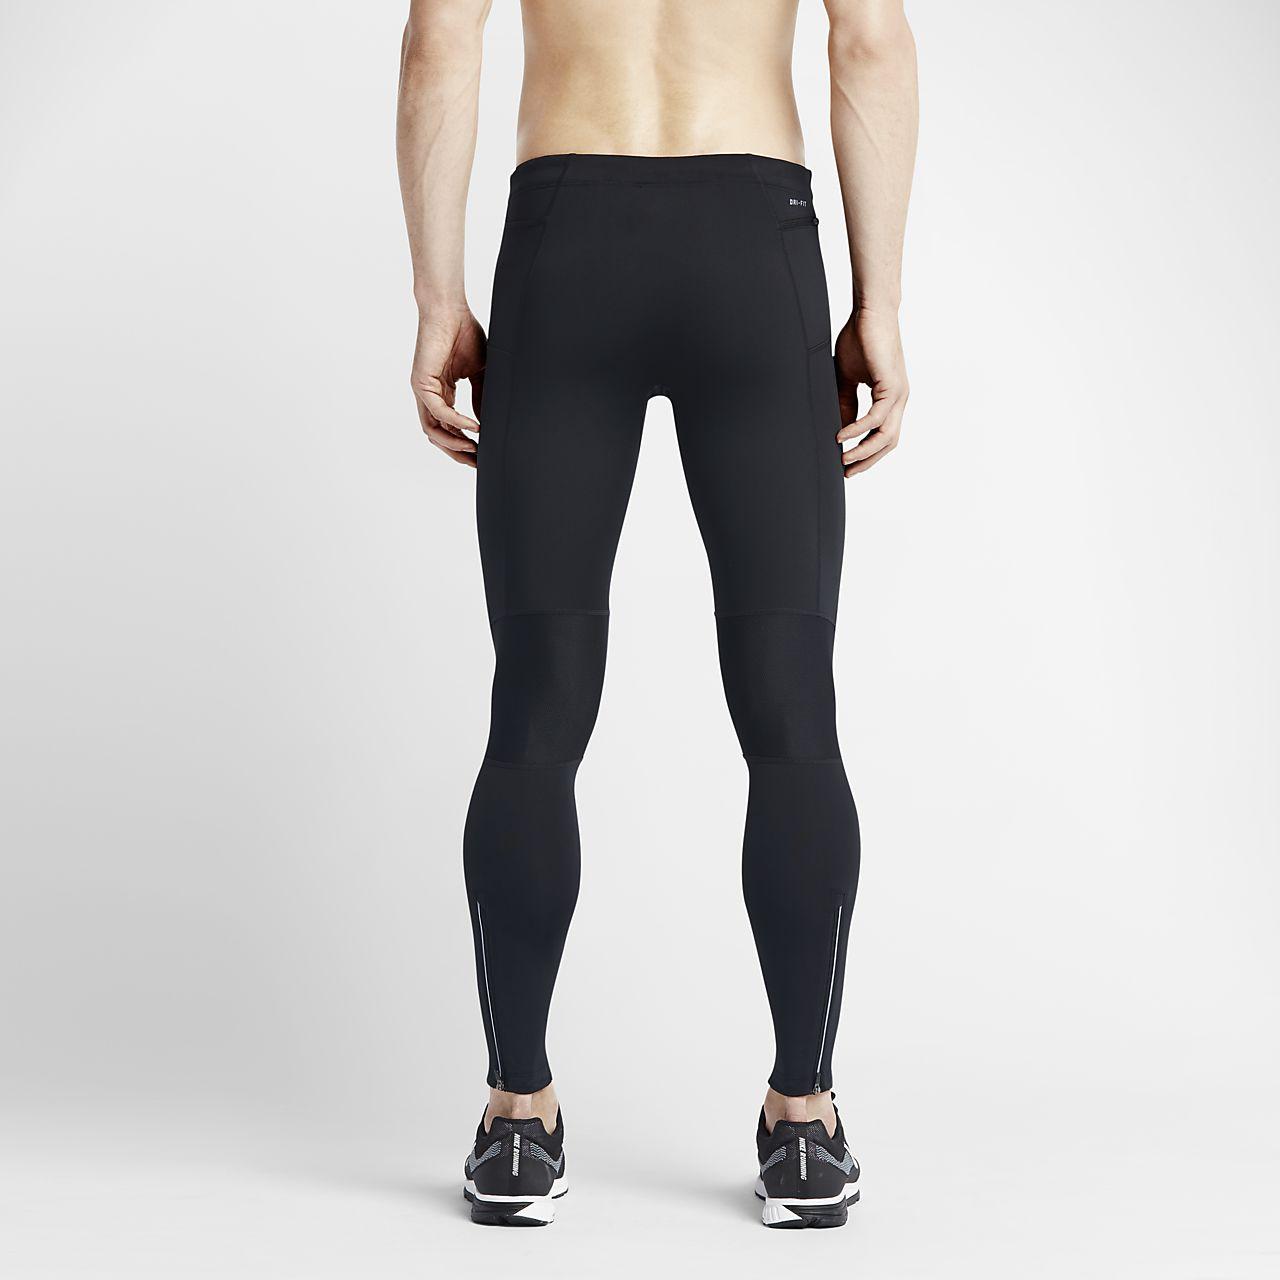 ... Nike Power Tech Men's Running Tights